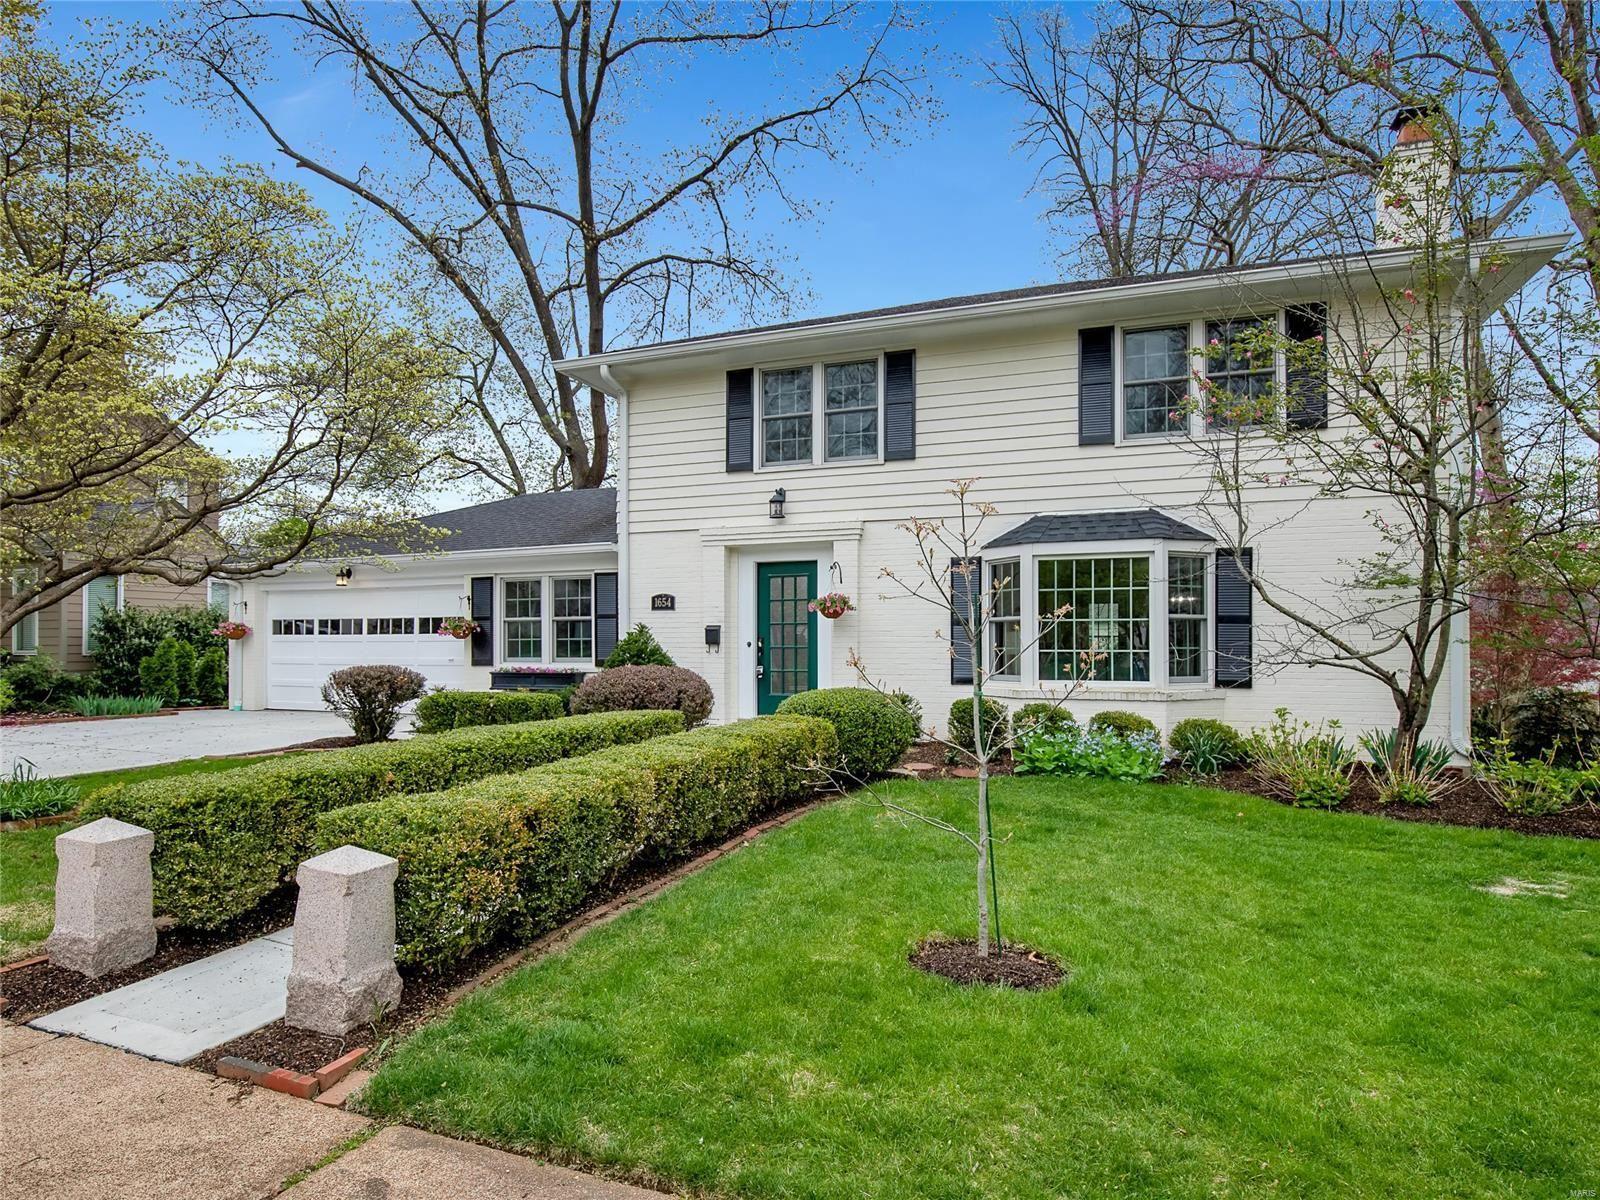 1654 Dearborn Drive, Warson Woods, MO 63122 - MLS#: 21021737